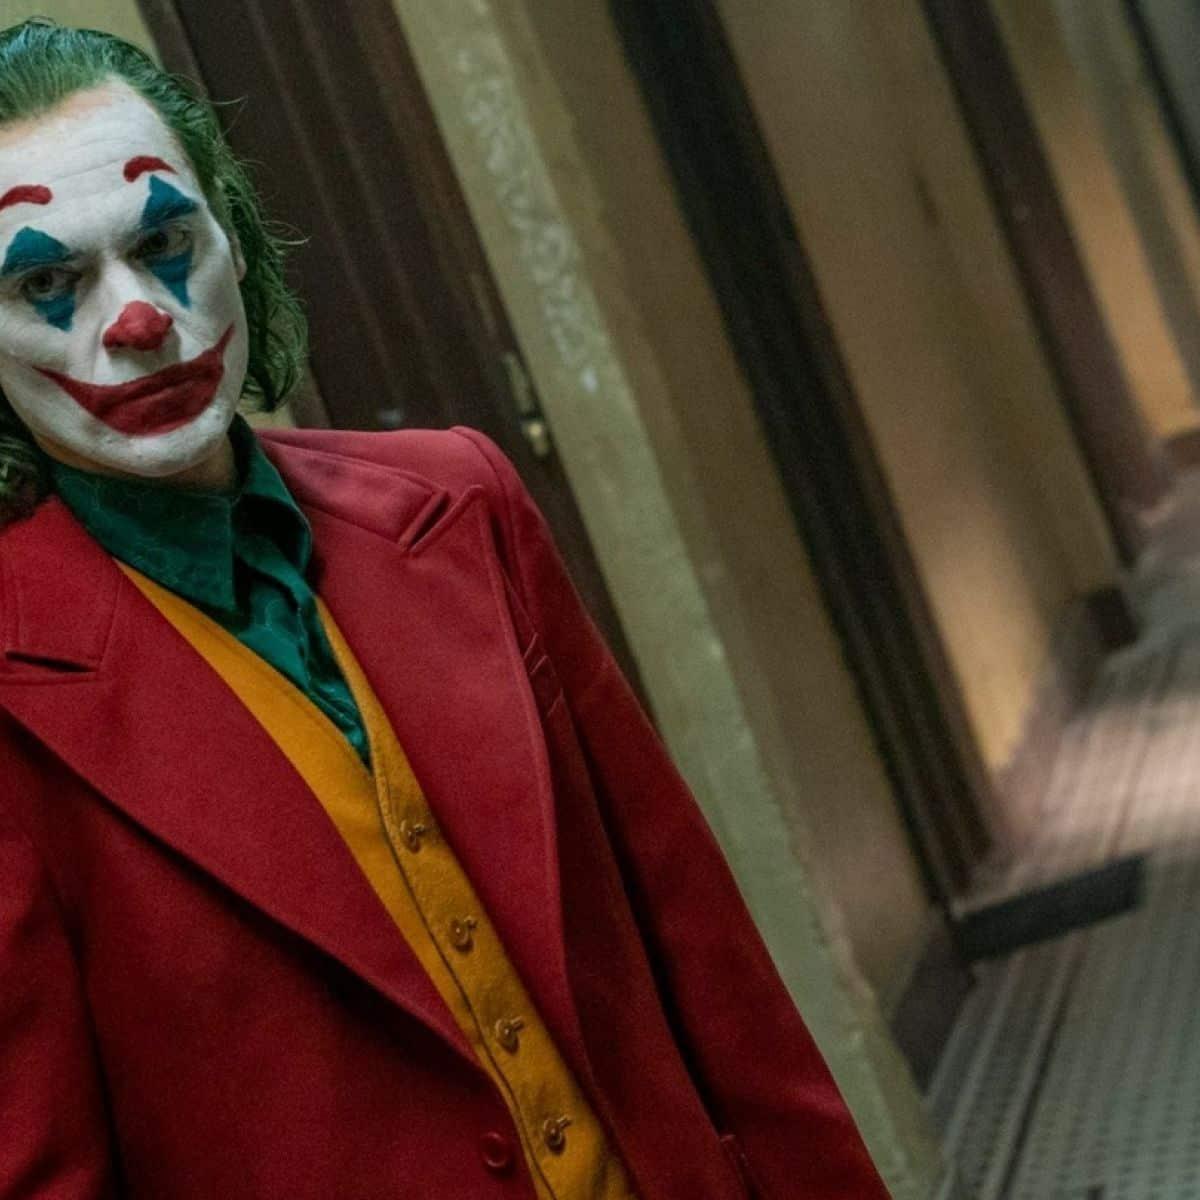 image 2 2 The 20 Biggest Ways Joker Breaks the Superhero Mold